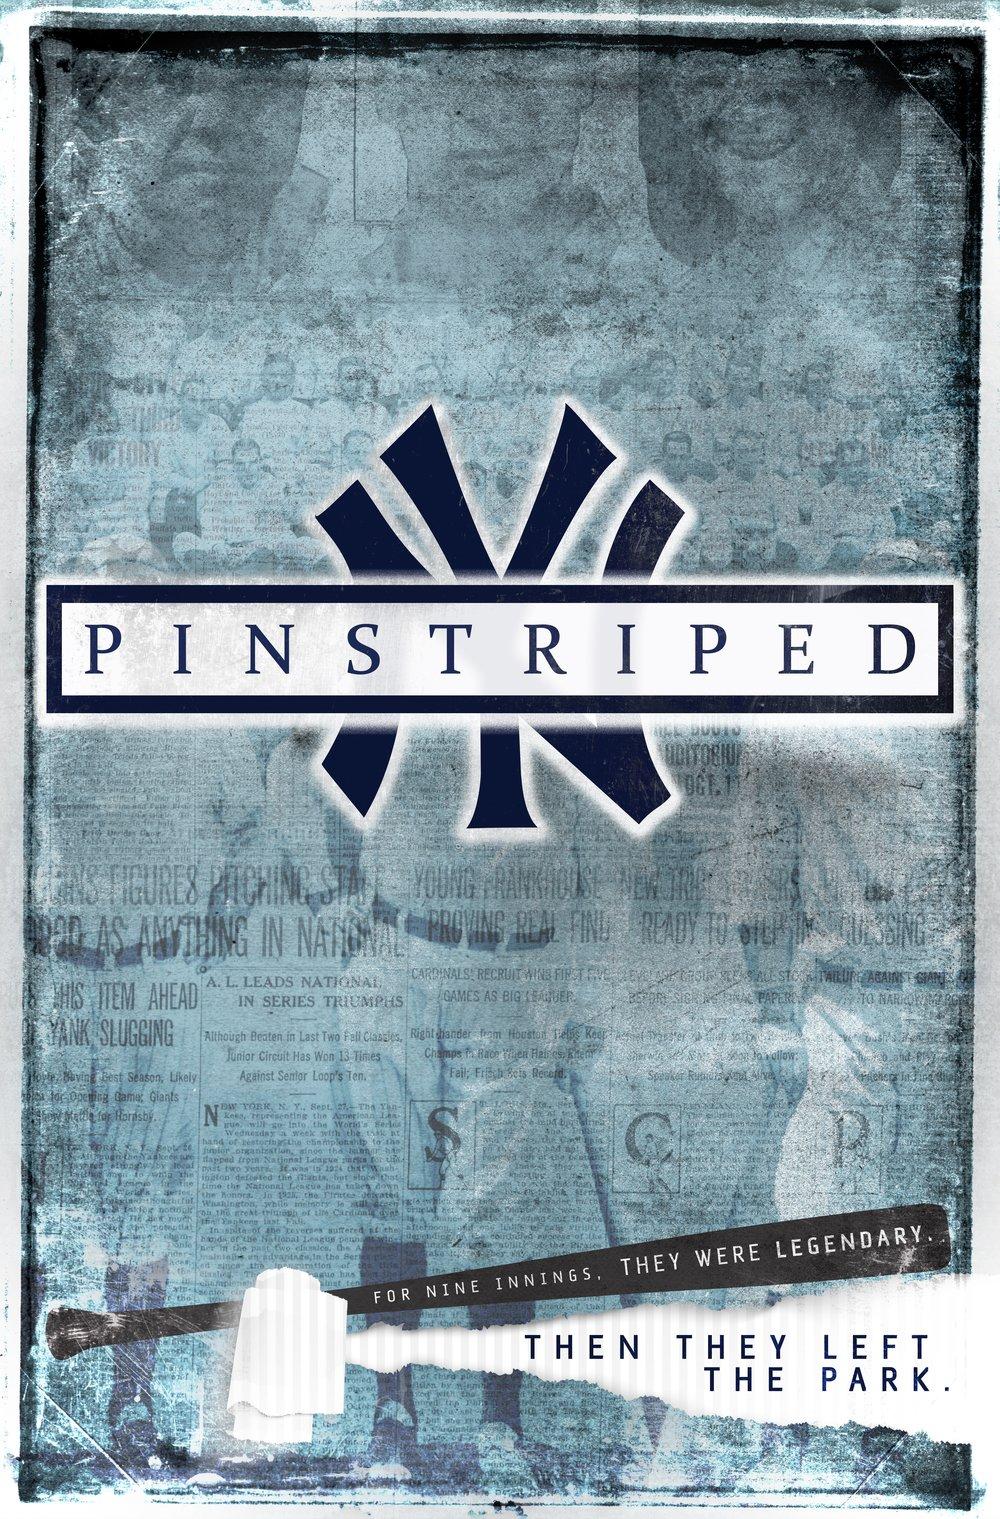 pinstriped navy.jpg